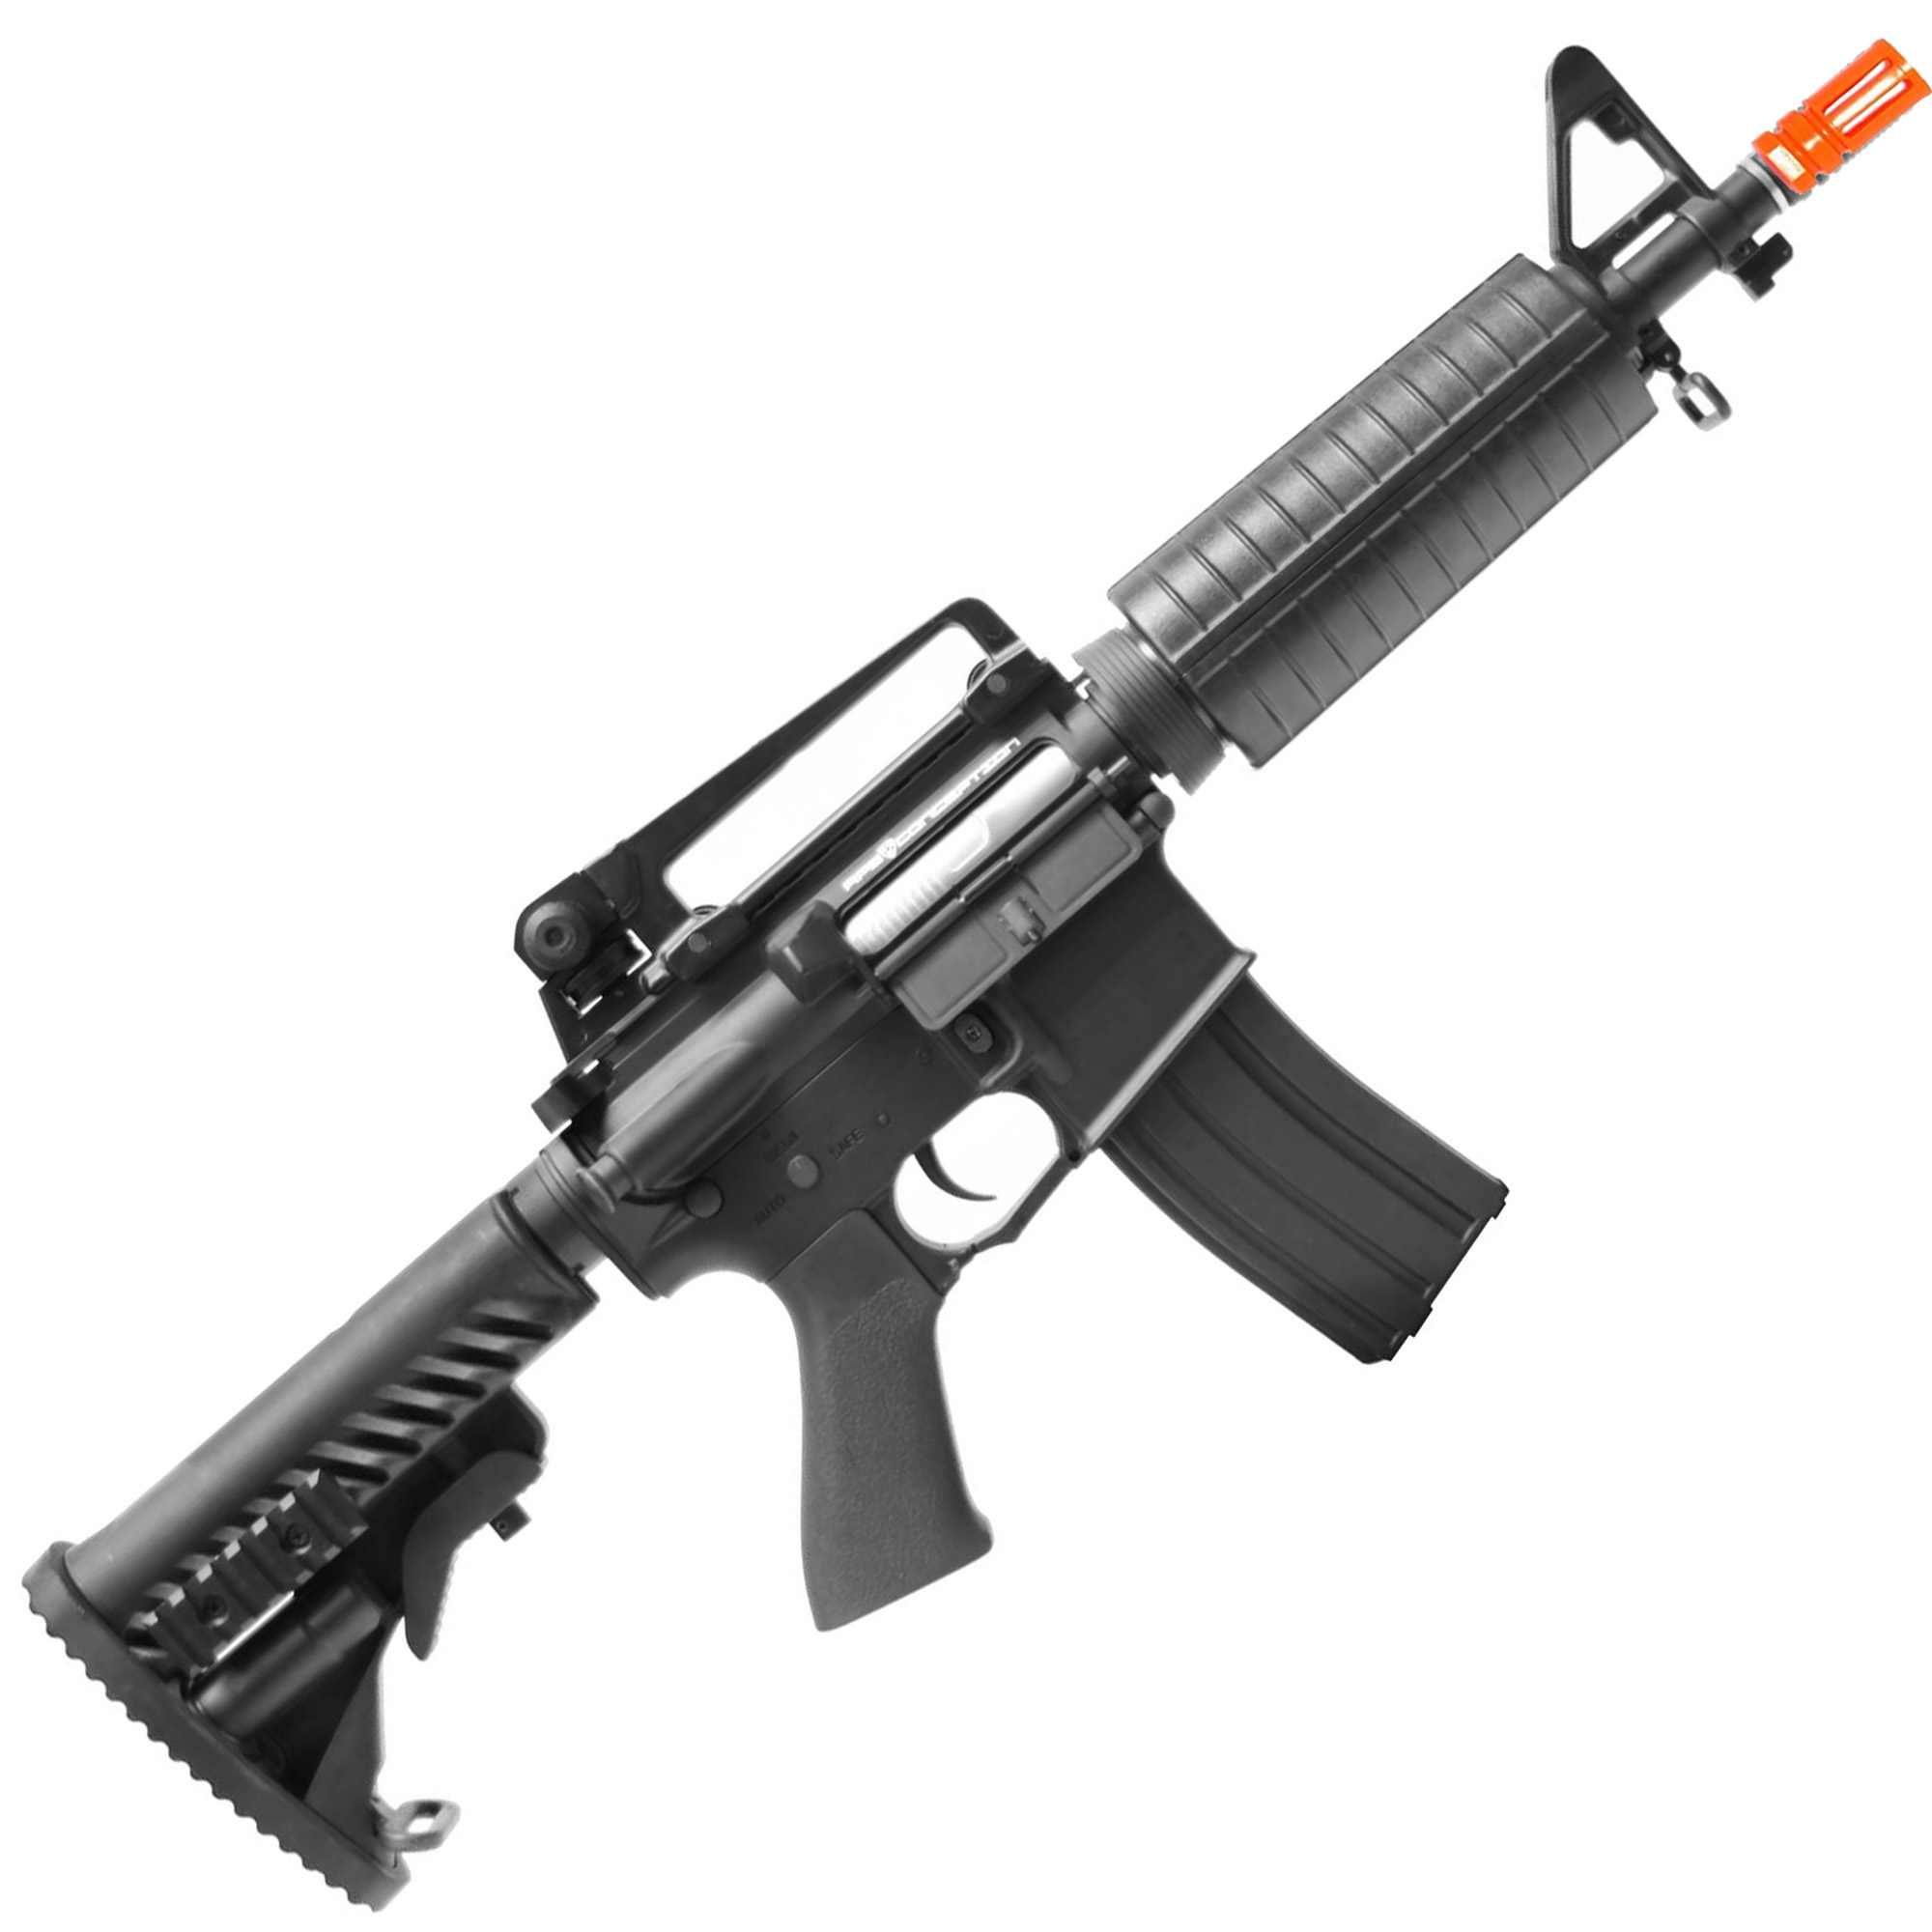 RIFLE DE AIRSOFT AEG M4 M933 STYLE FULL METAL COM BLOWBACK ASR105 - APS